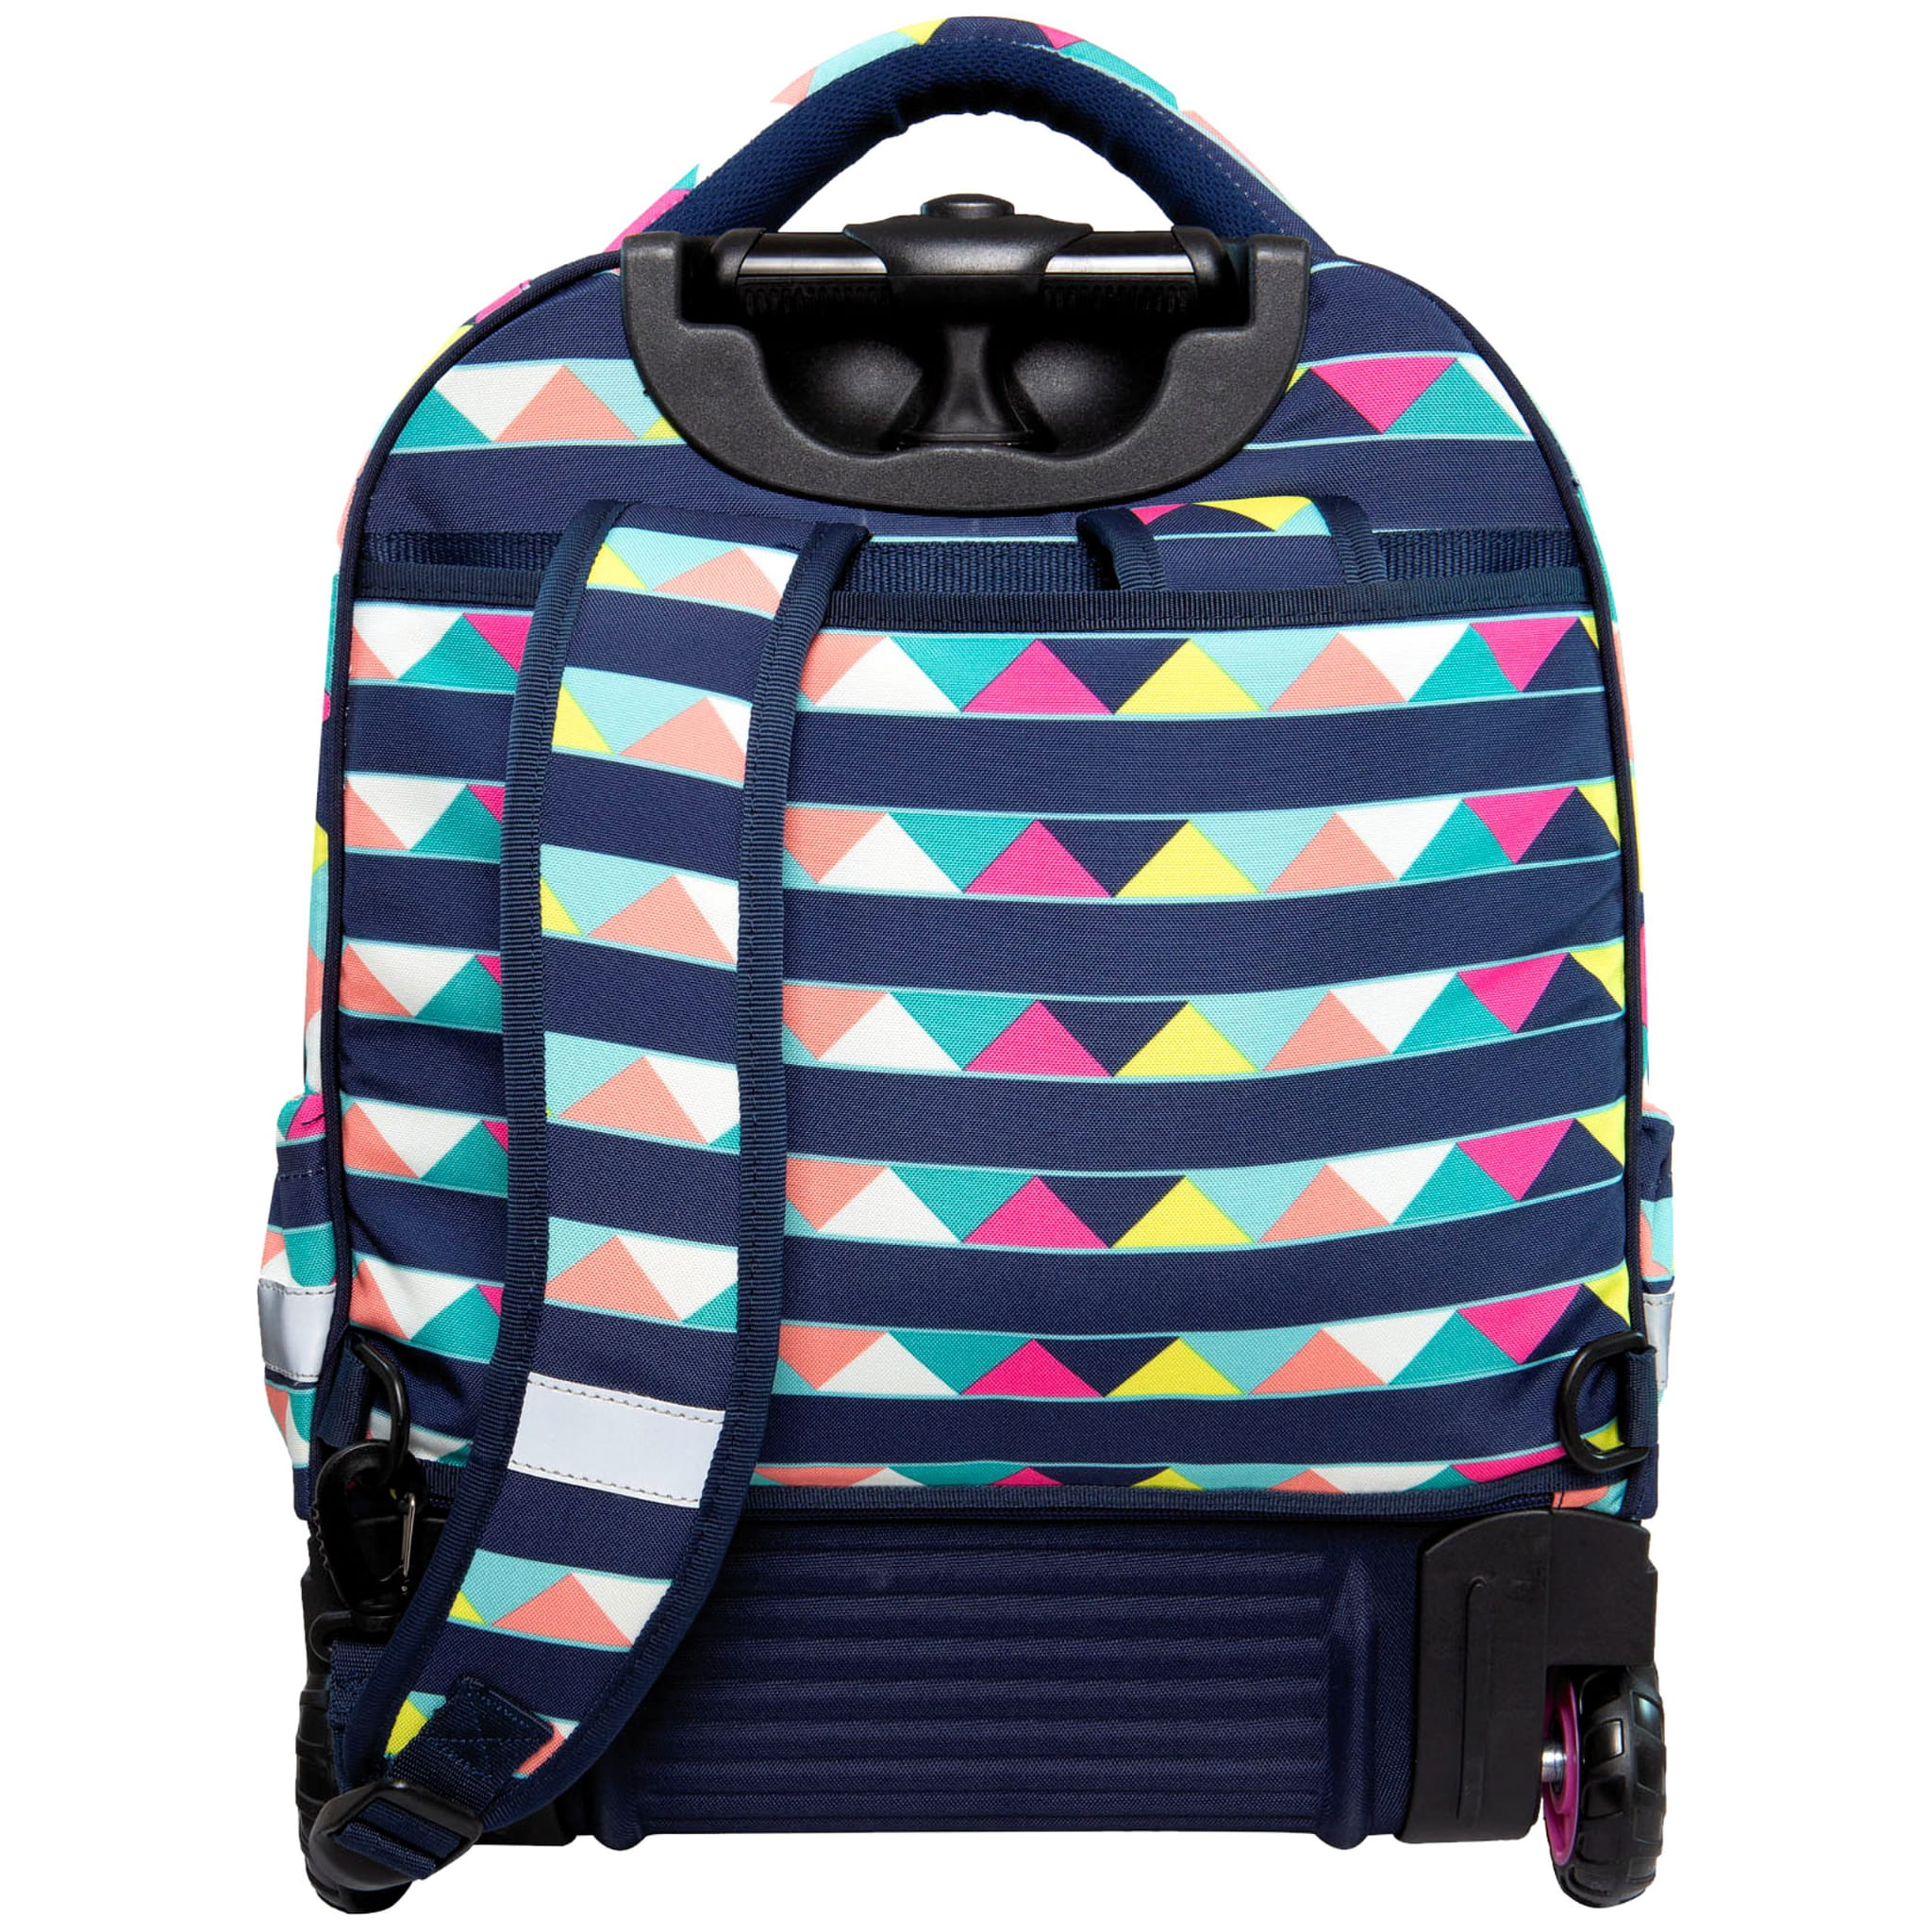 37f8c4aa45eb0 CoolPack CANCUN kolorowe trójkąty STARR 27l plecak szkolny na ...